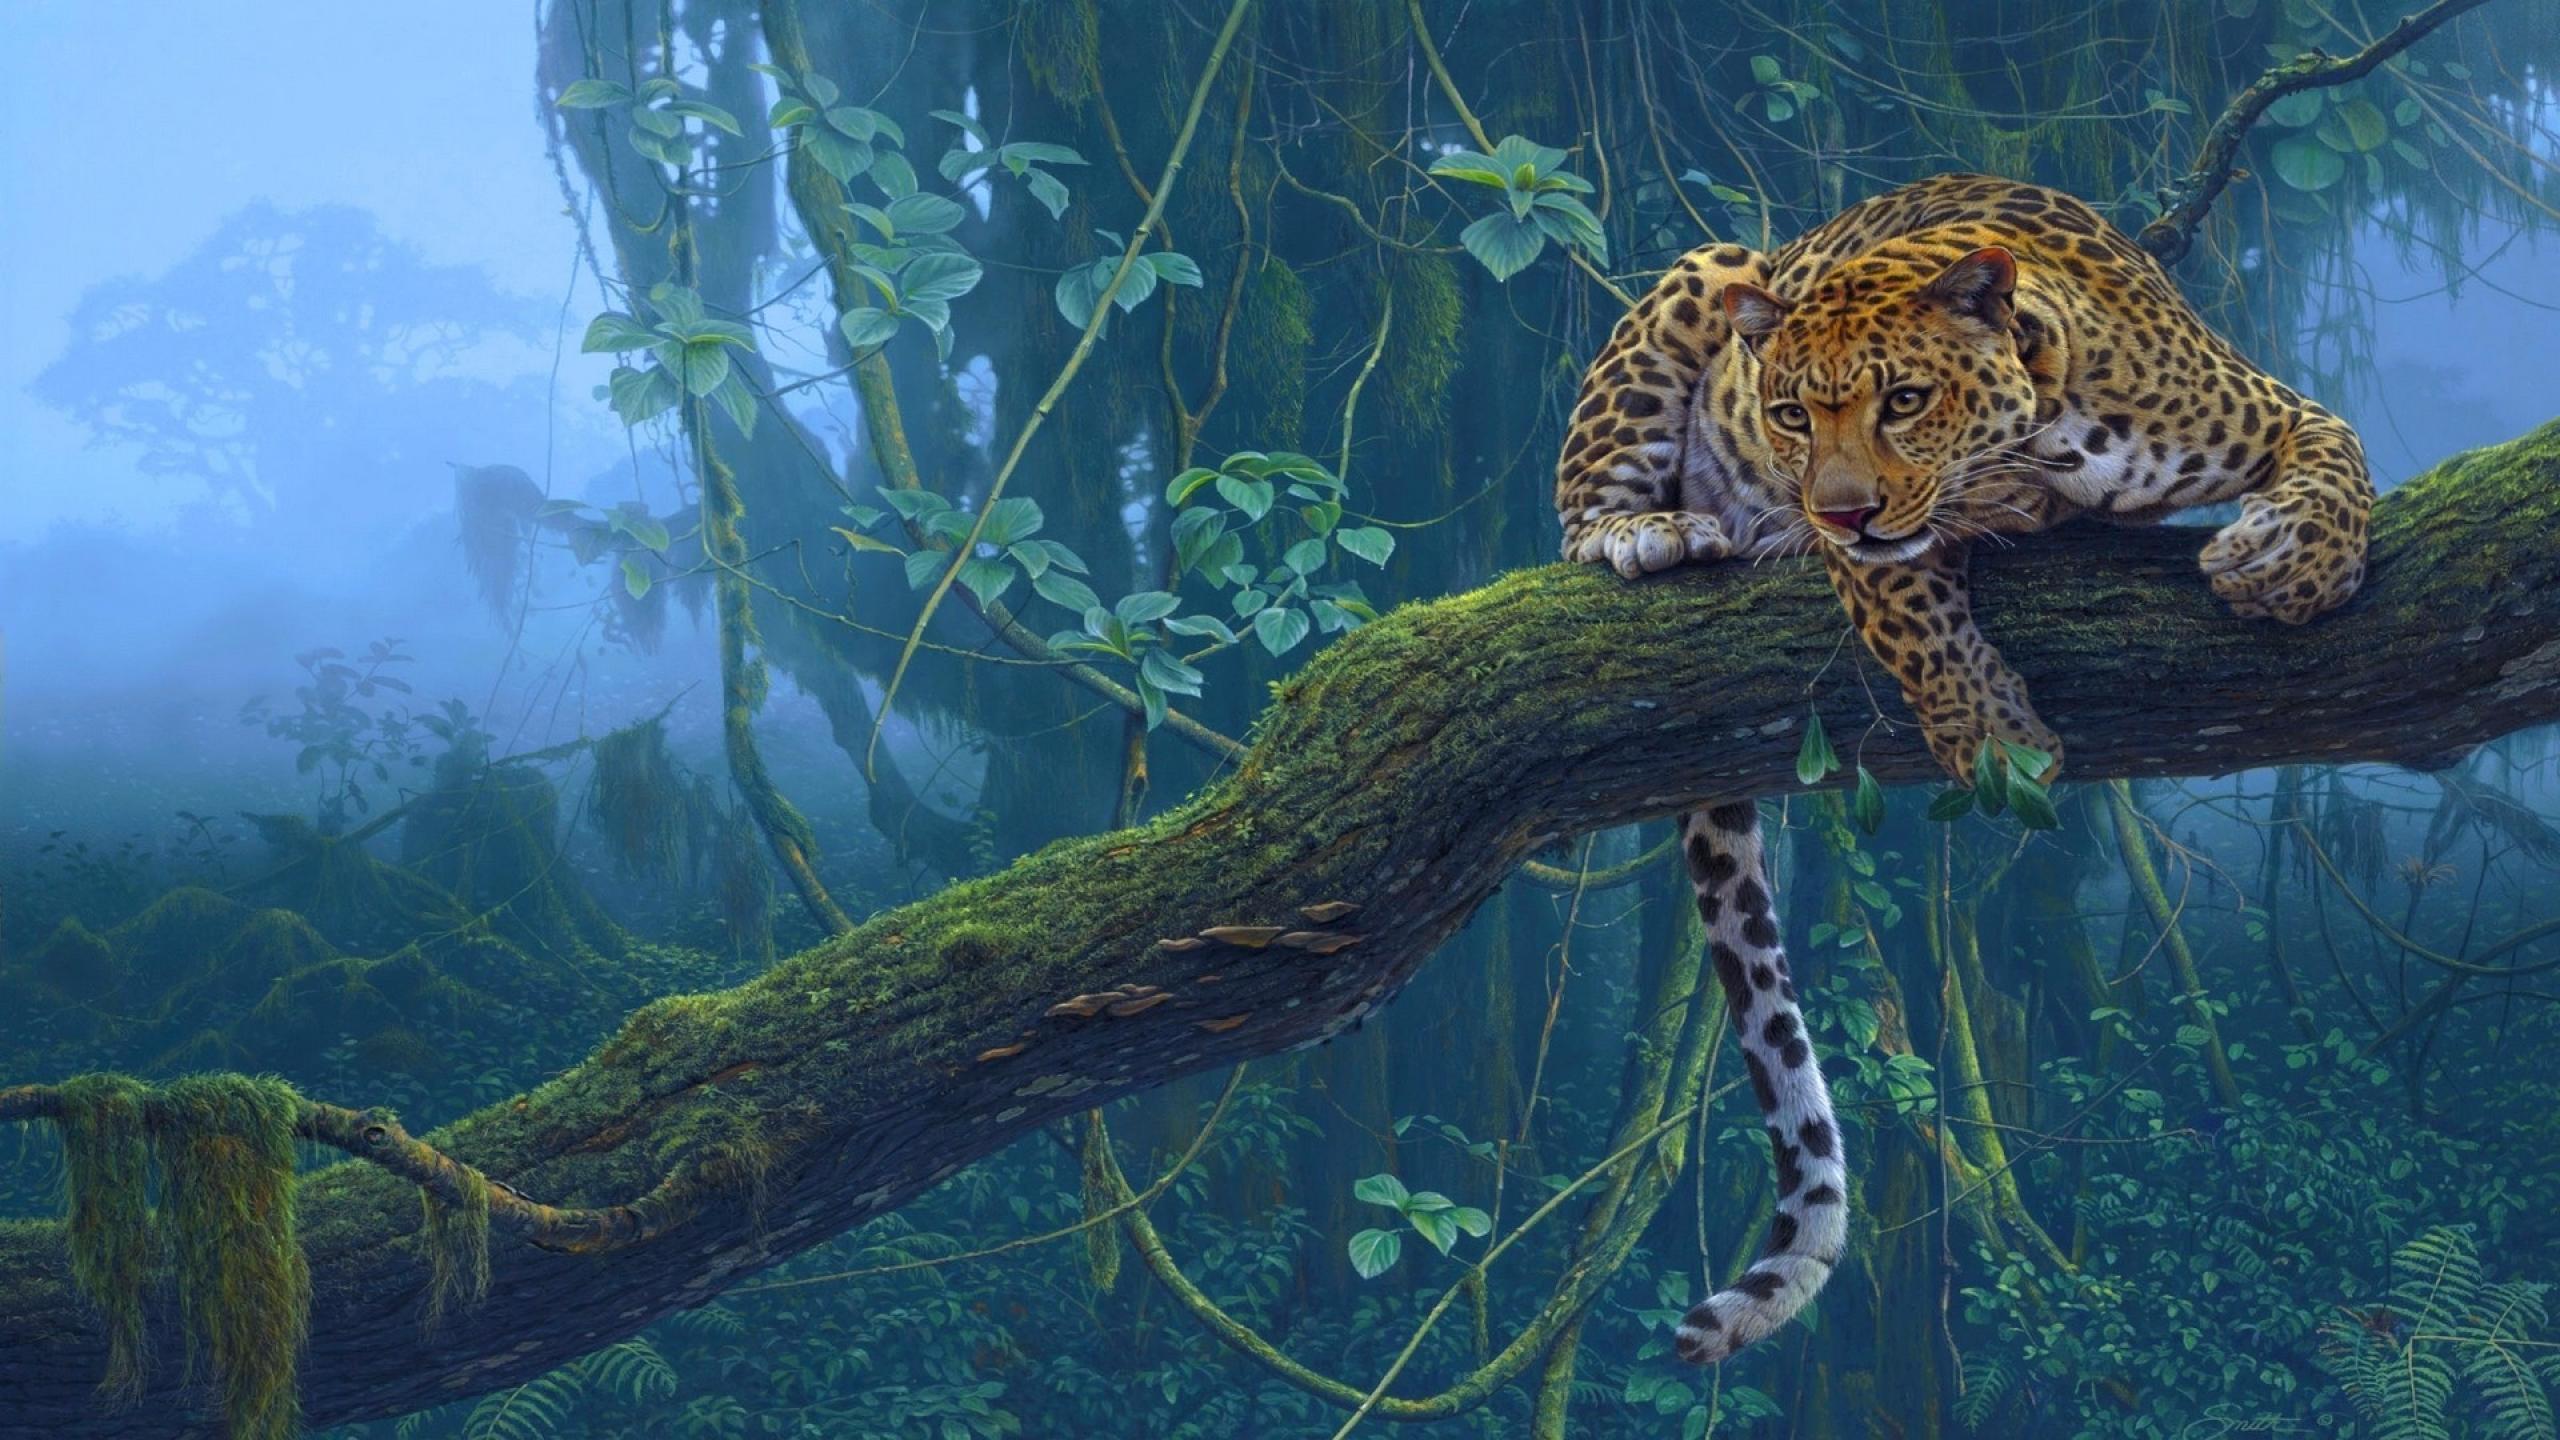 Fondo De Pantalla Selva: 36 Rainforest HD Wallpapers